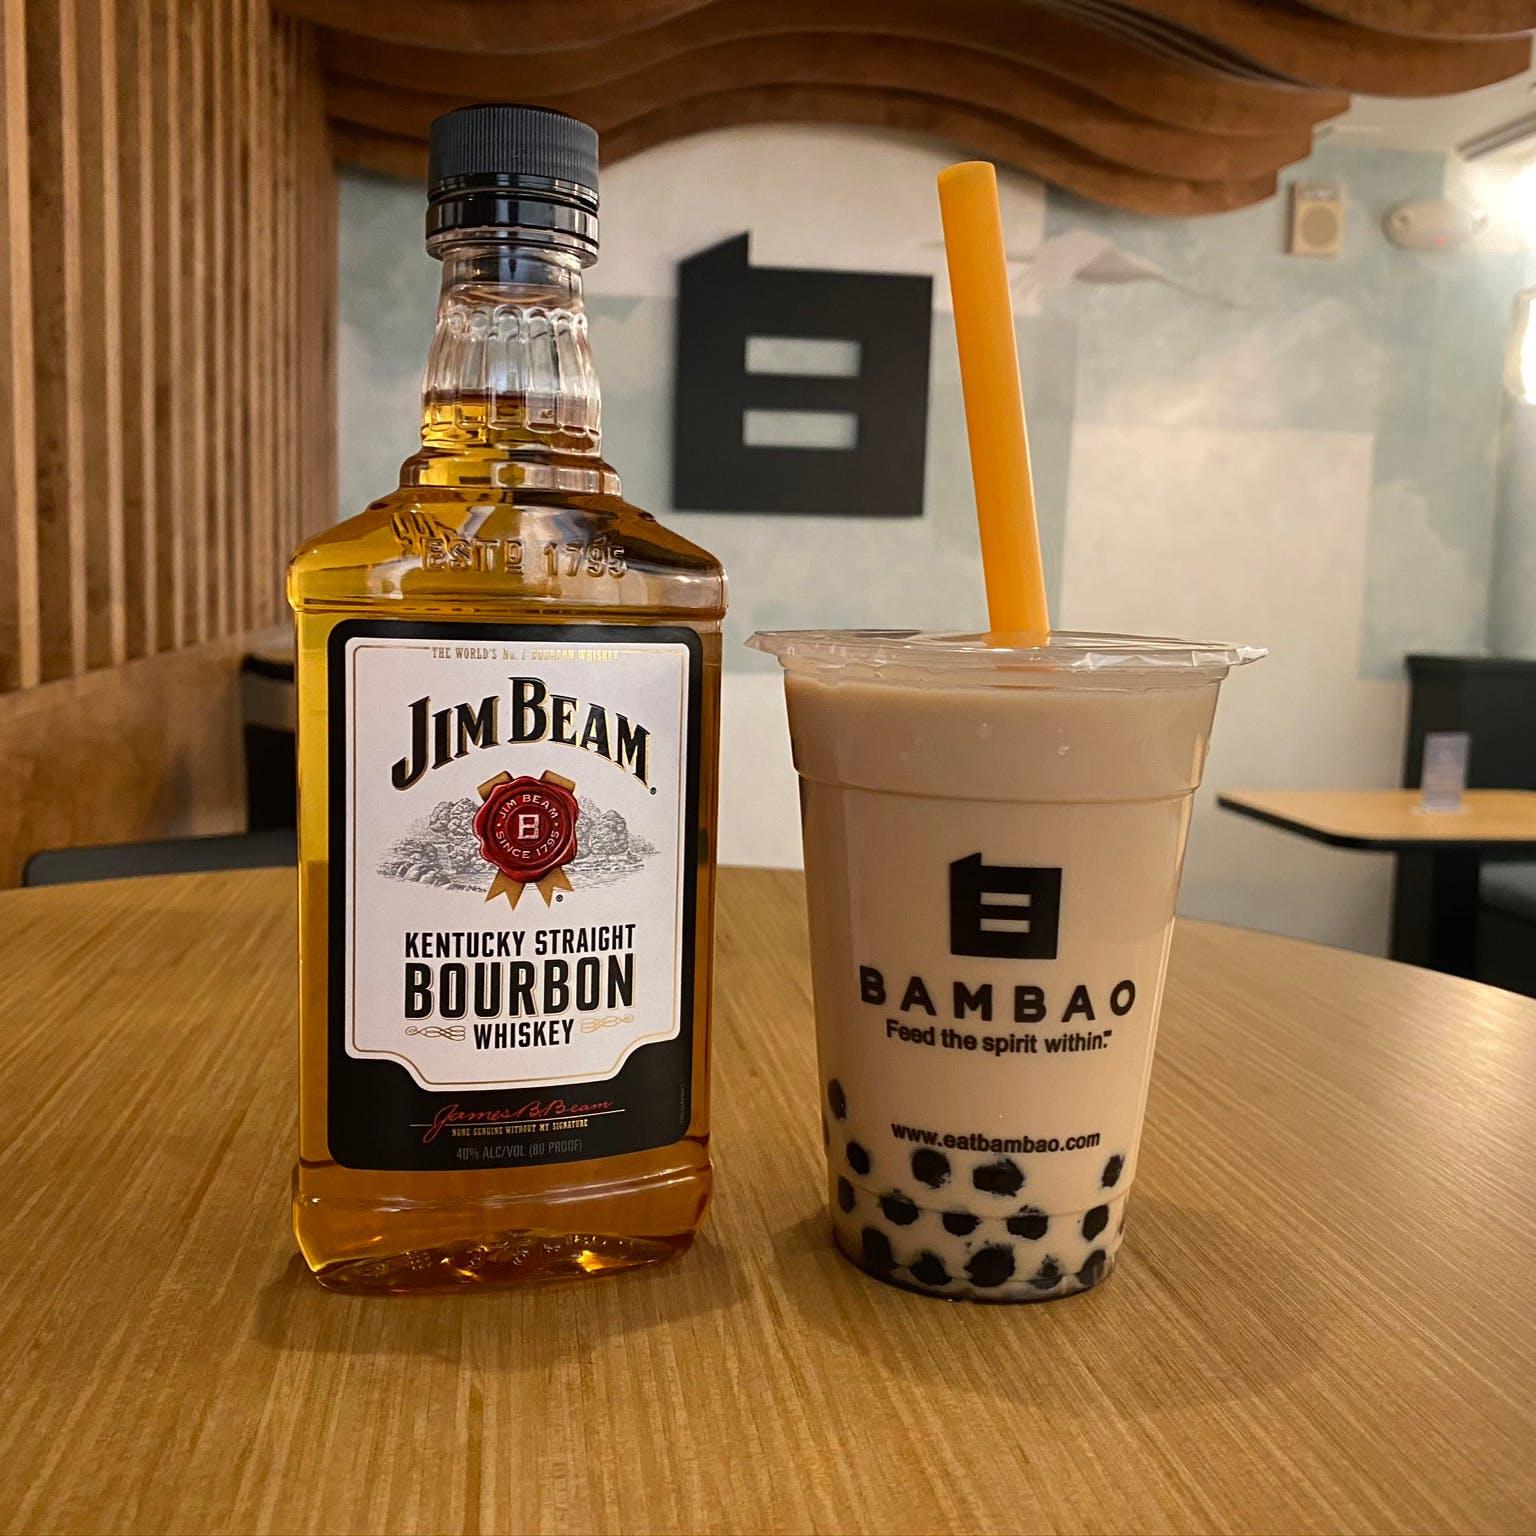 Bourbon Milk Tea from Bambao